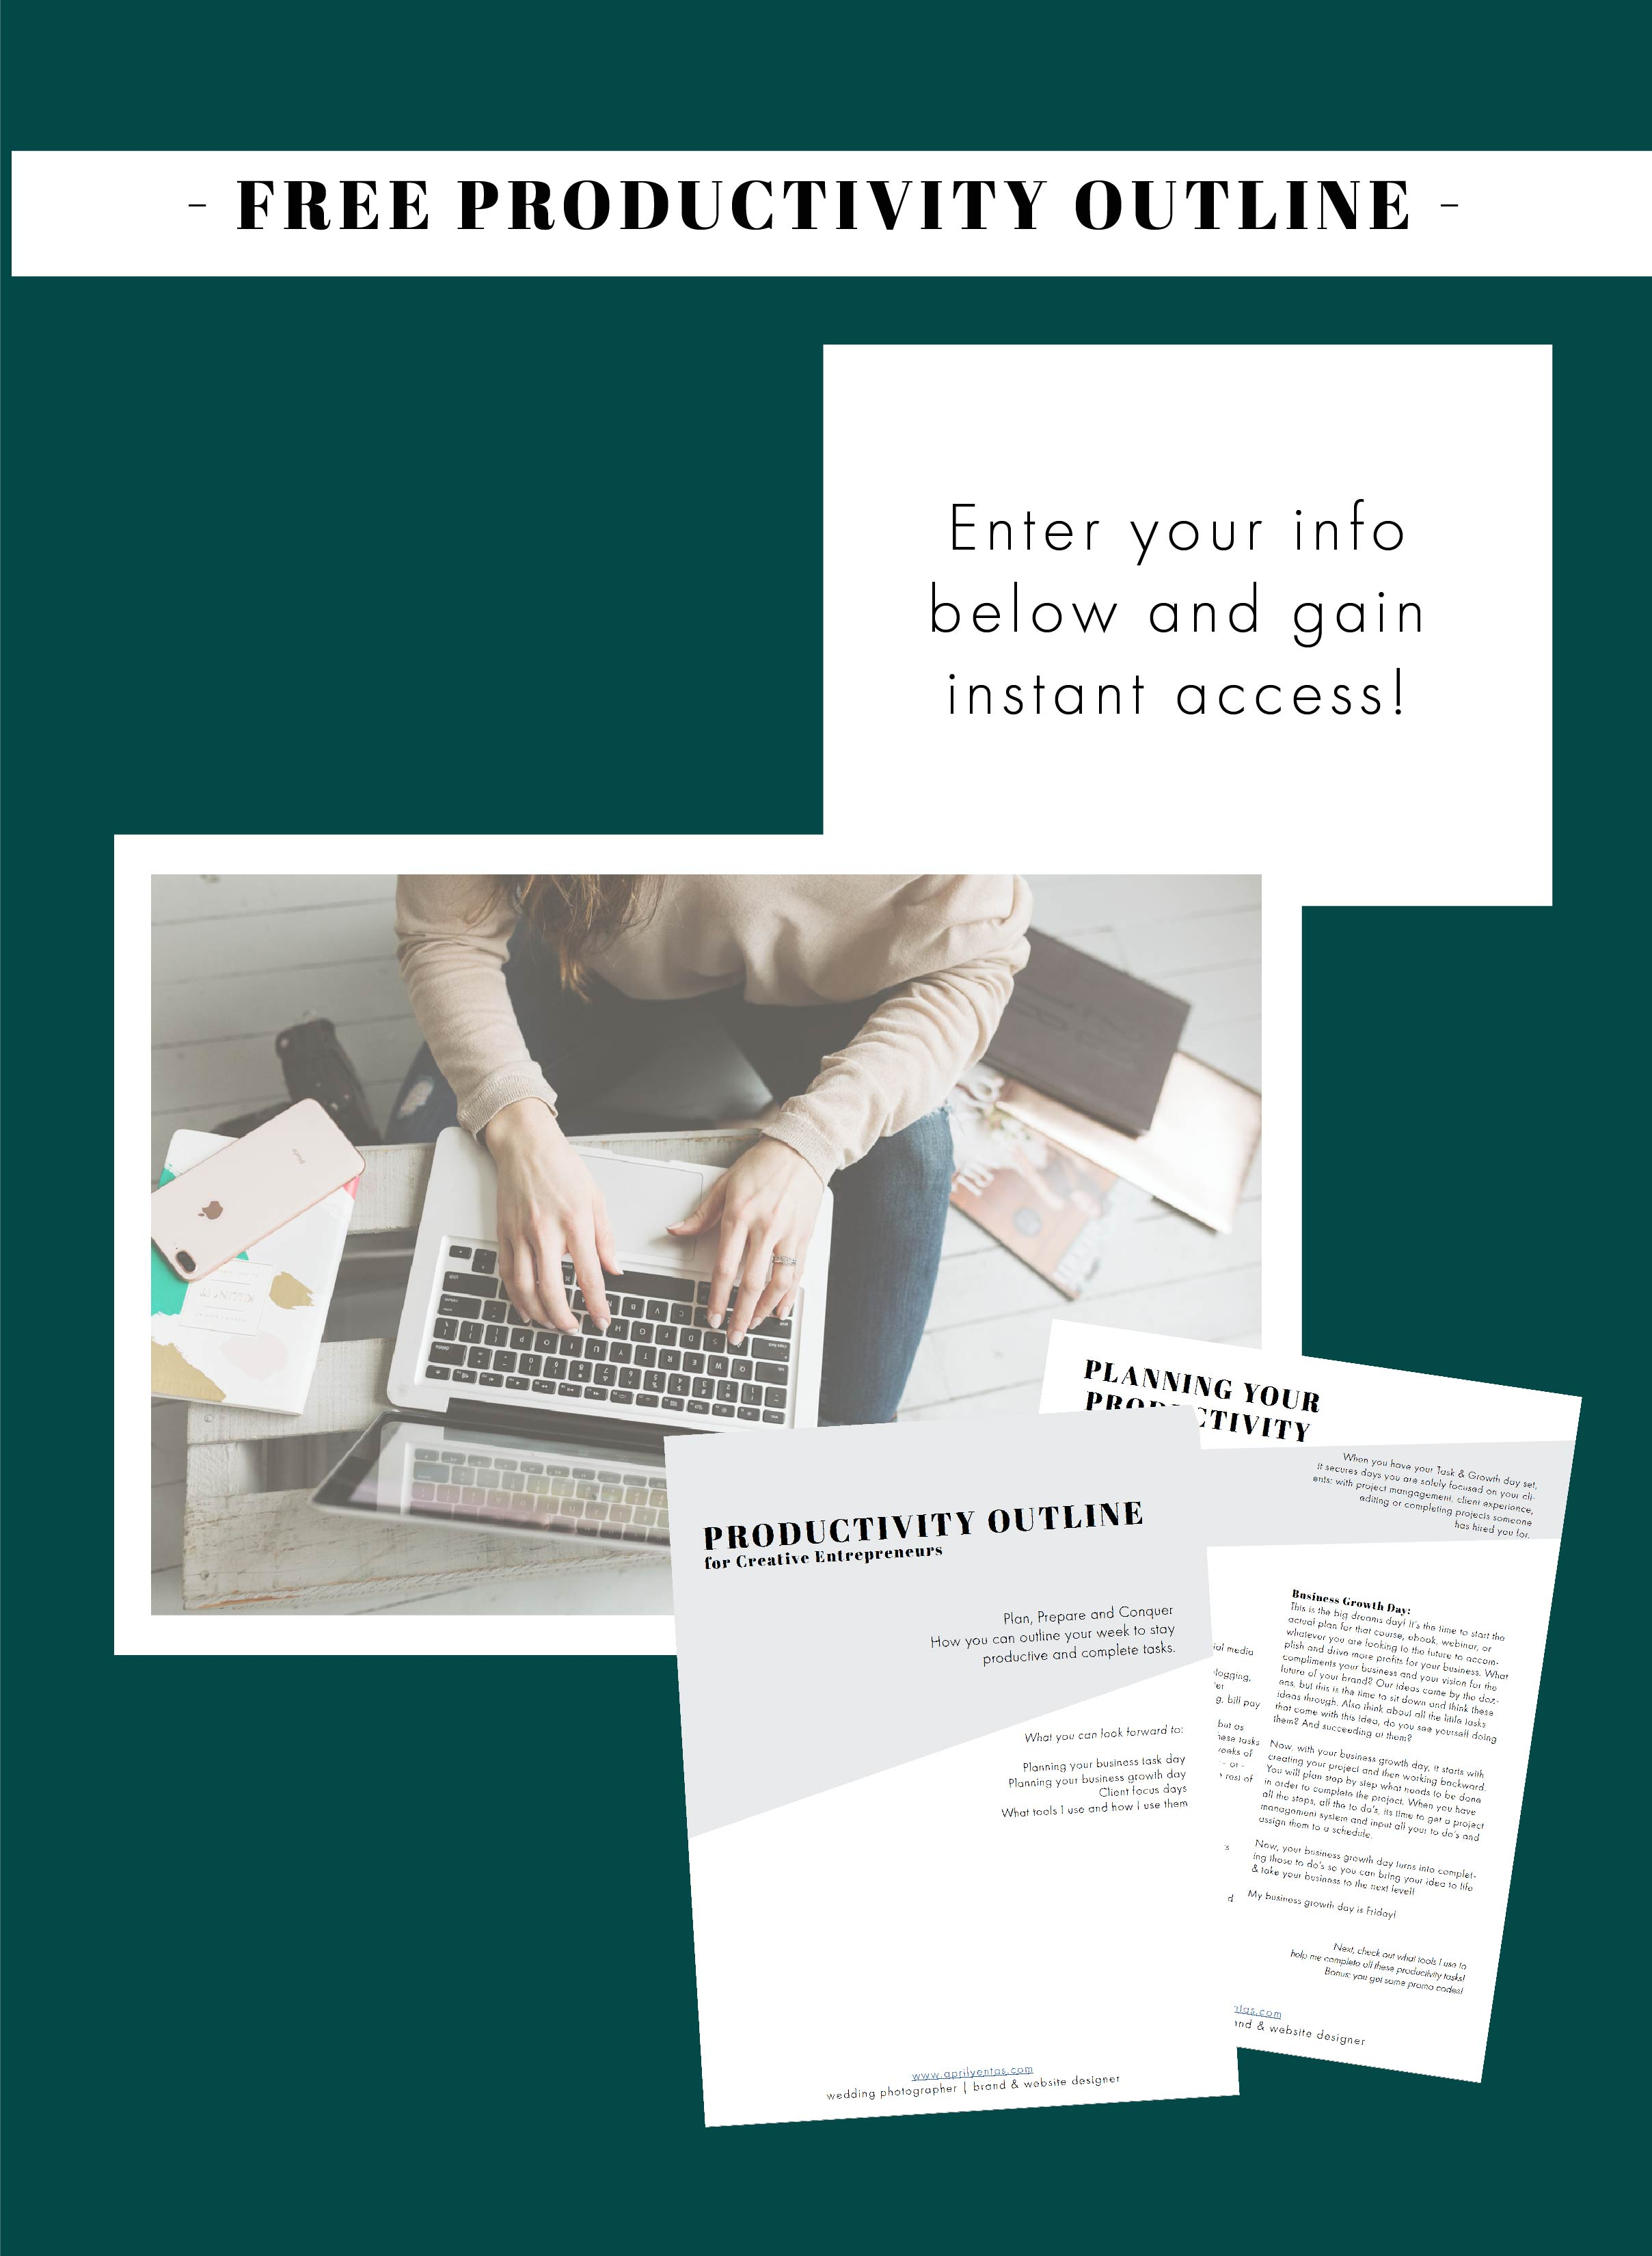 productivity outline freebie | tips for entrepreneurs